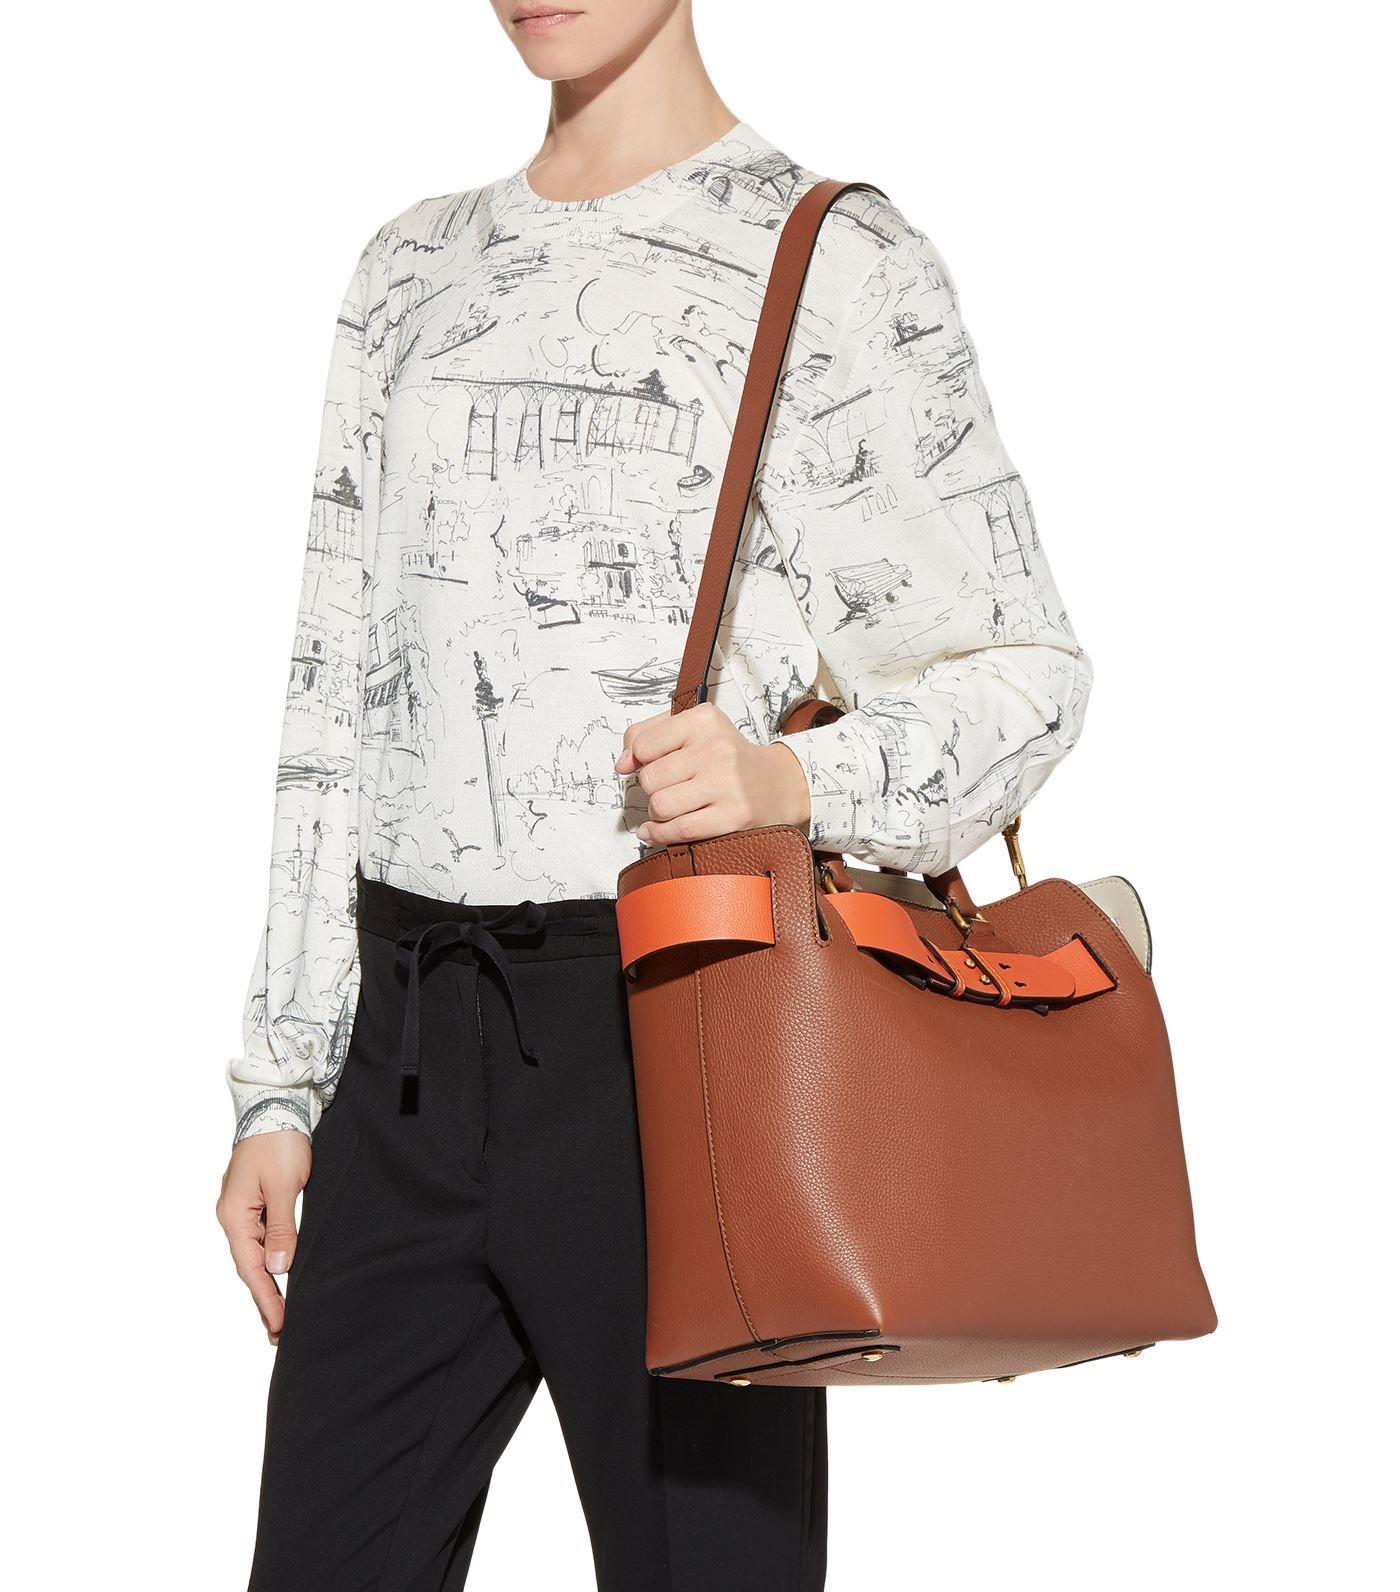 a743e92bb227 Burberry Medium Leather Belt Bag